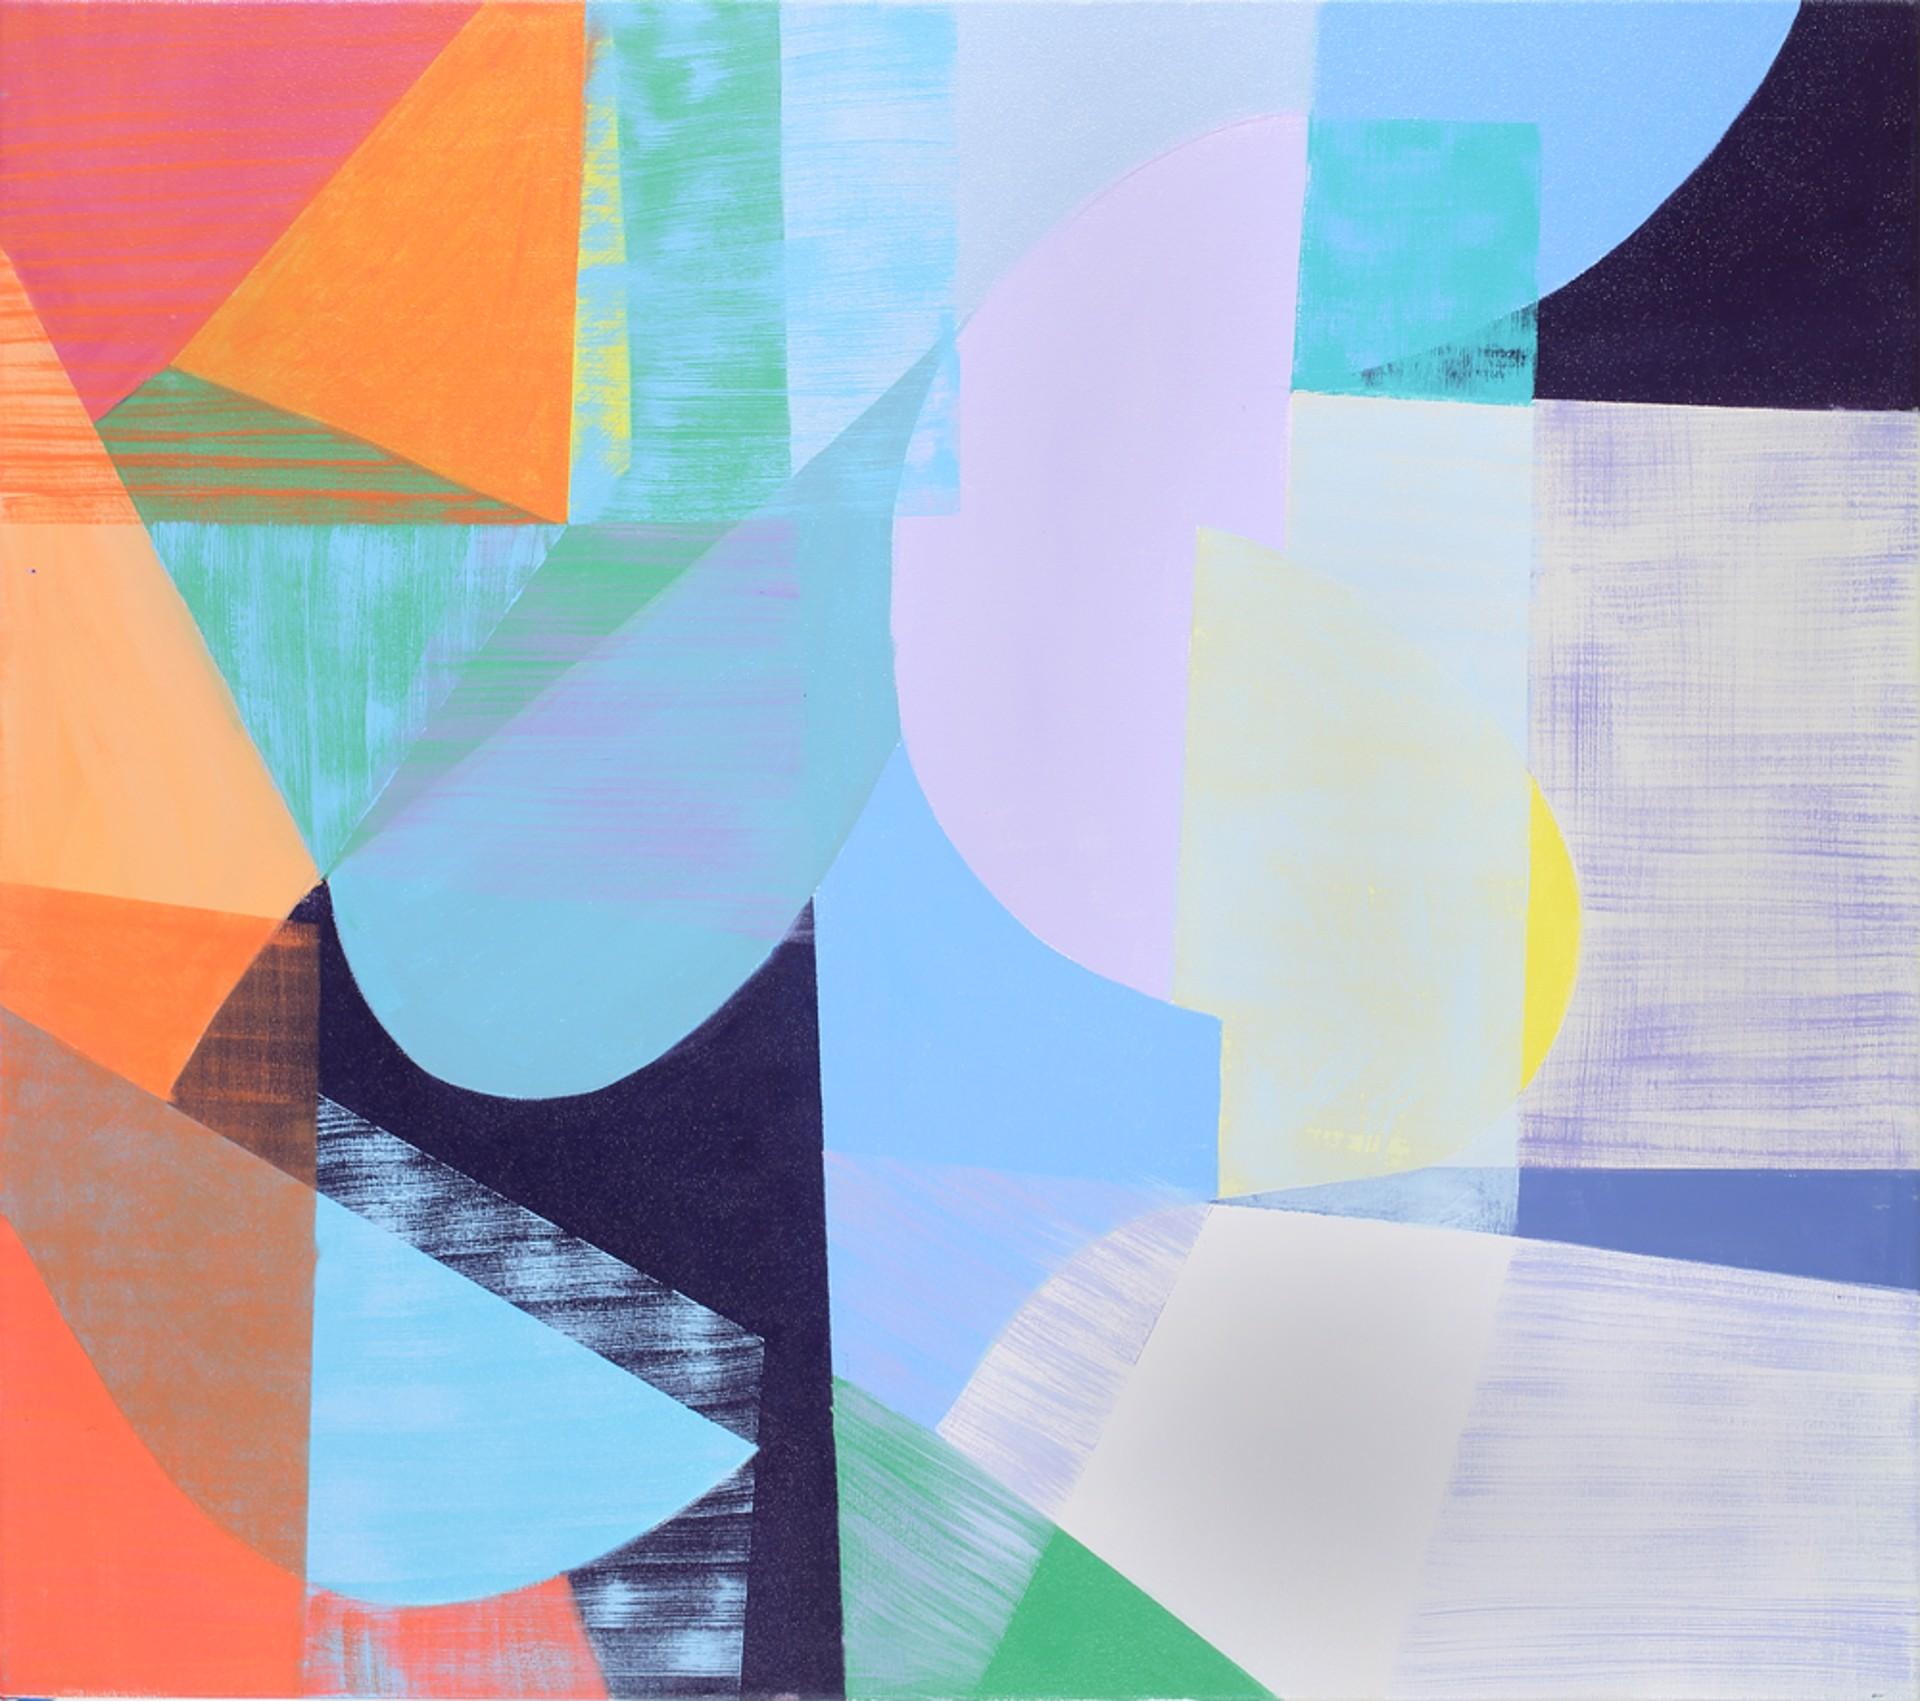 Tananger- On Hold by Lori Glavin